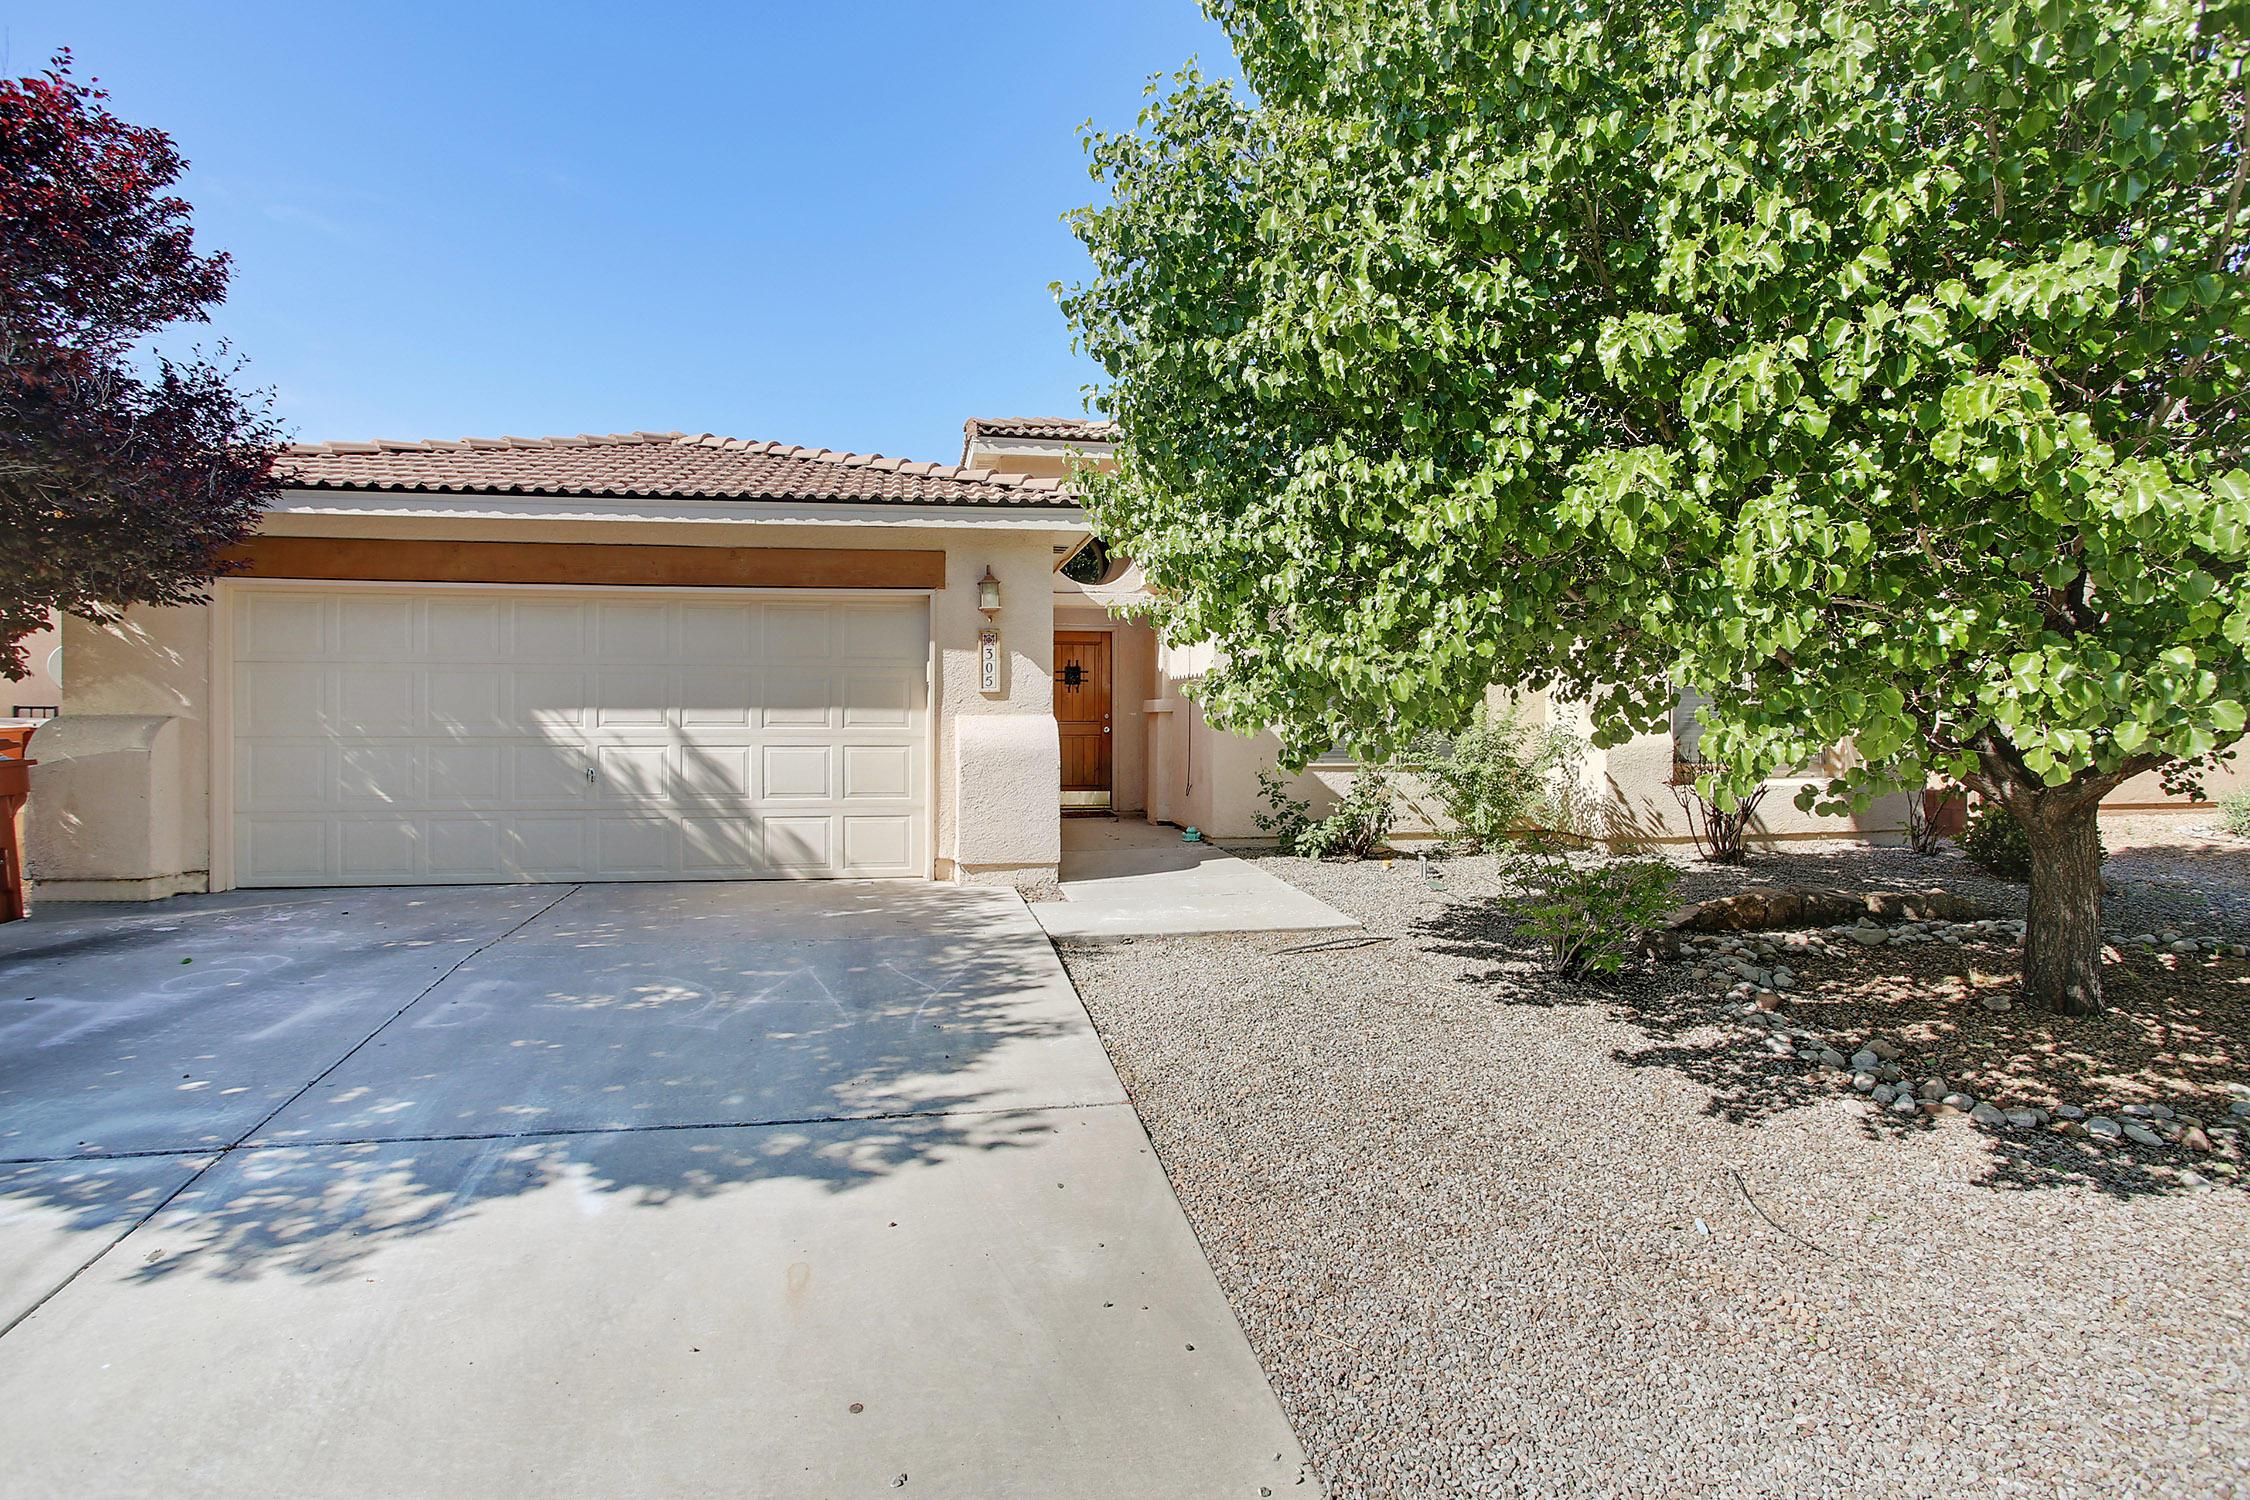 305 CALLE EVANGELINE, Bernalillo, NM 87004 - Bernalillo, NM real estate listing